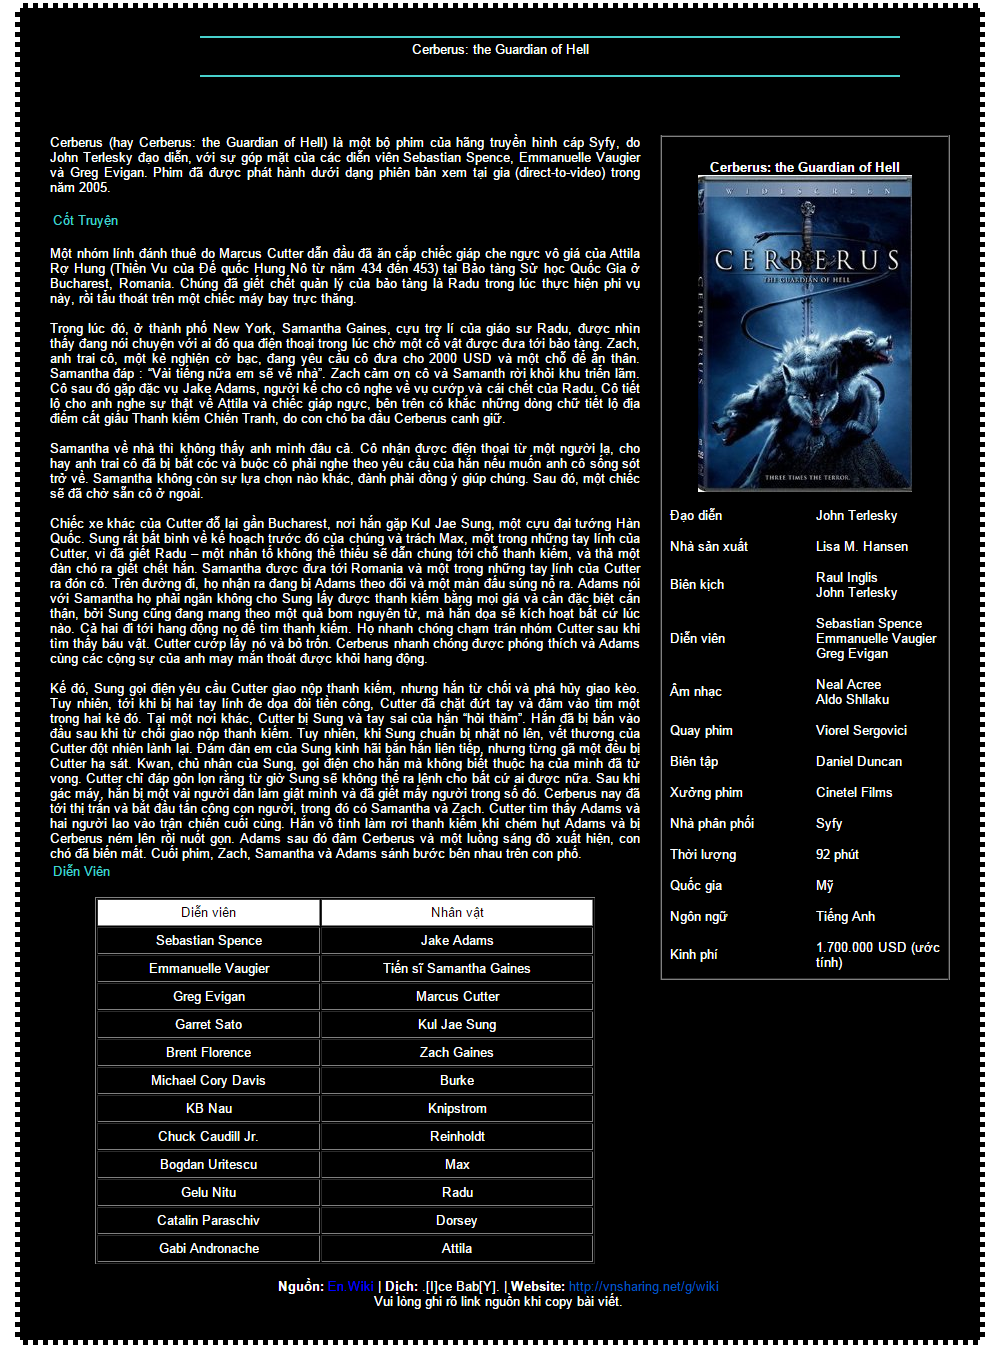 [Movie] Cerberus  2005  - oOo VnSharing oOo 15104552094_341d3208fe_o